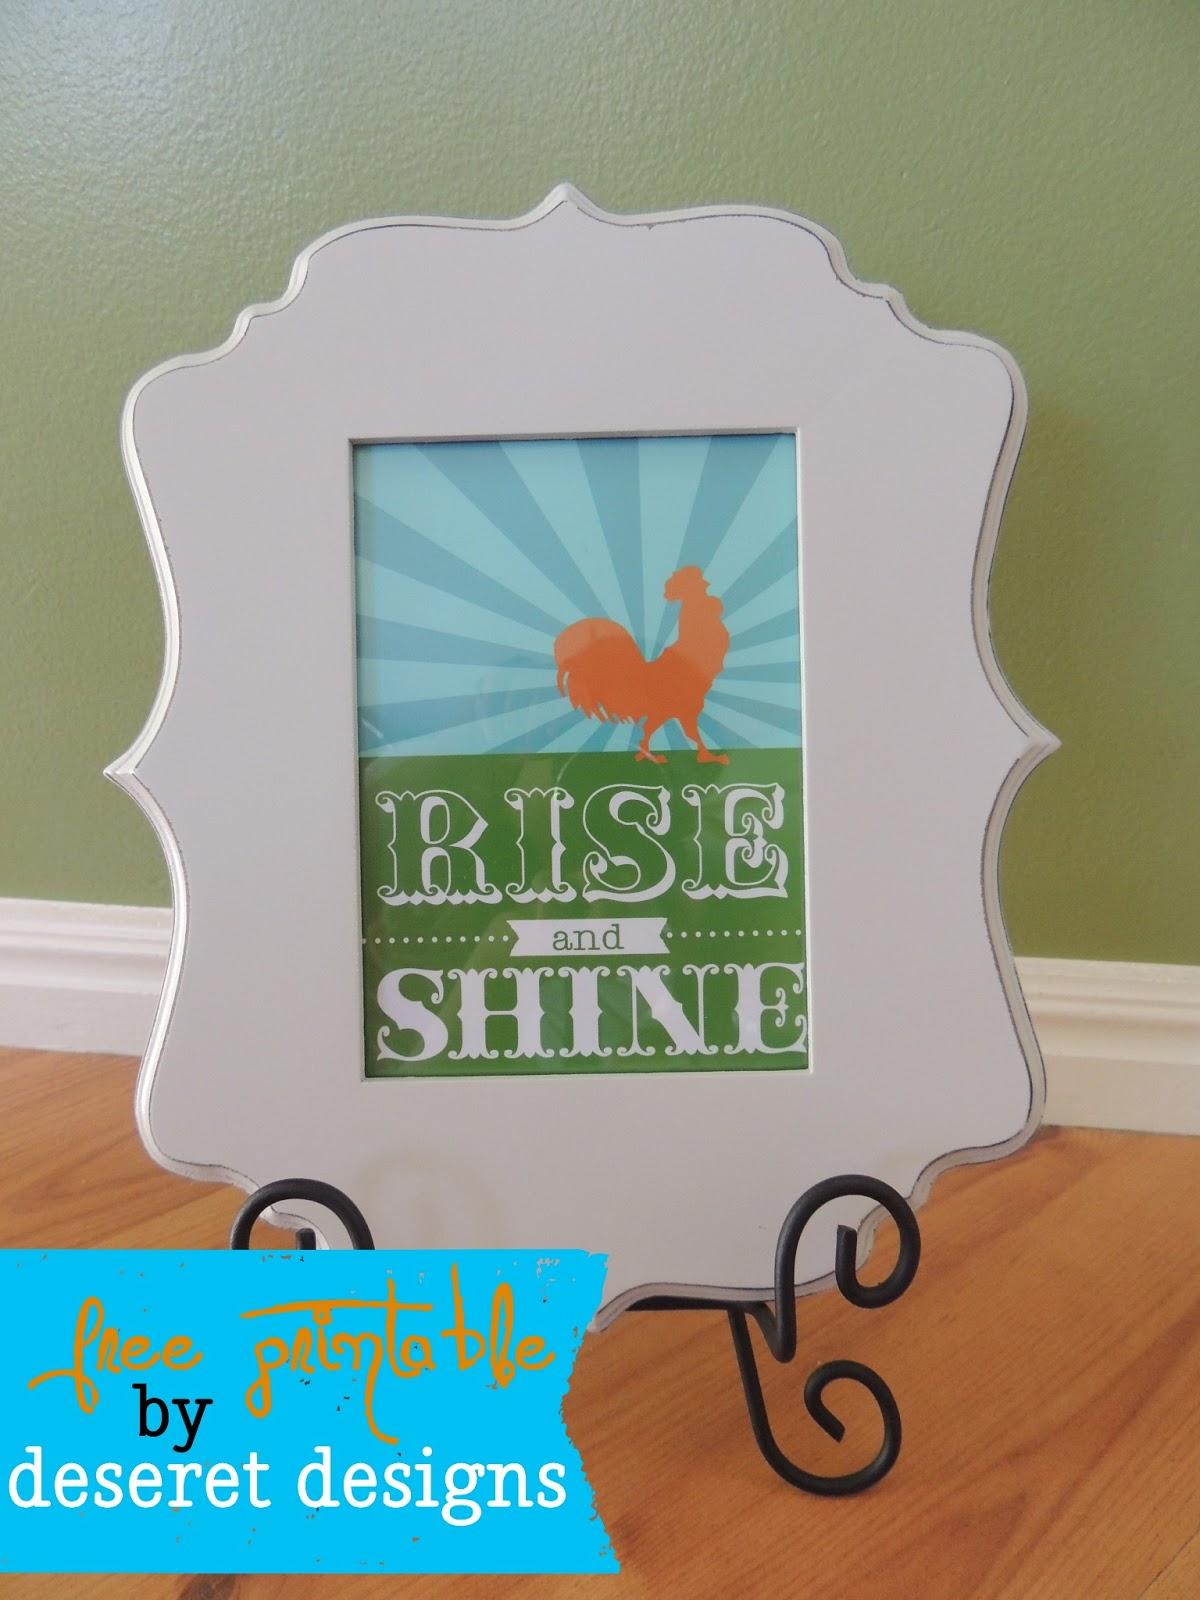 rise and shine - photo #22